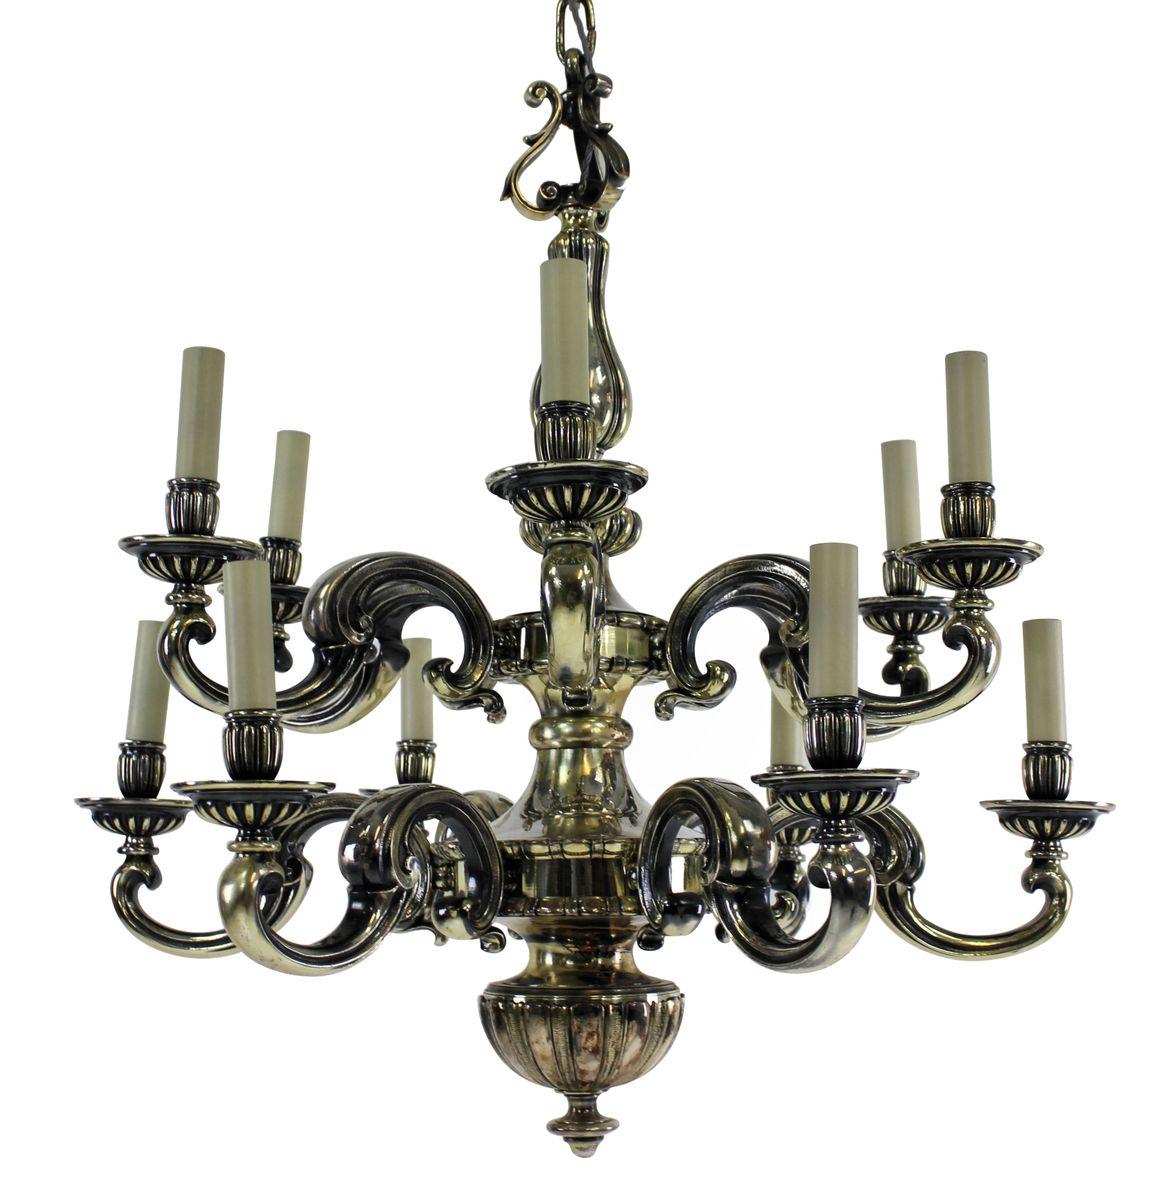 Antique Charles II Silver Chandelier - Antique Charles II Silver Chandelier For Sale At Pamono